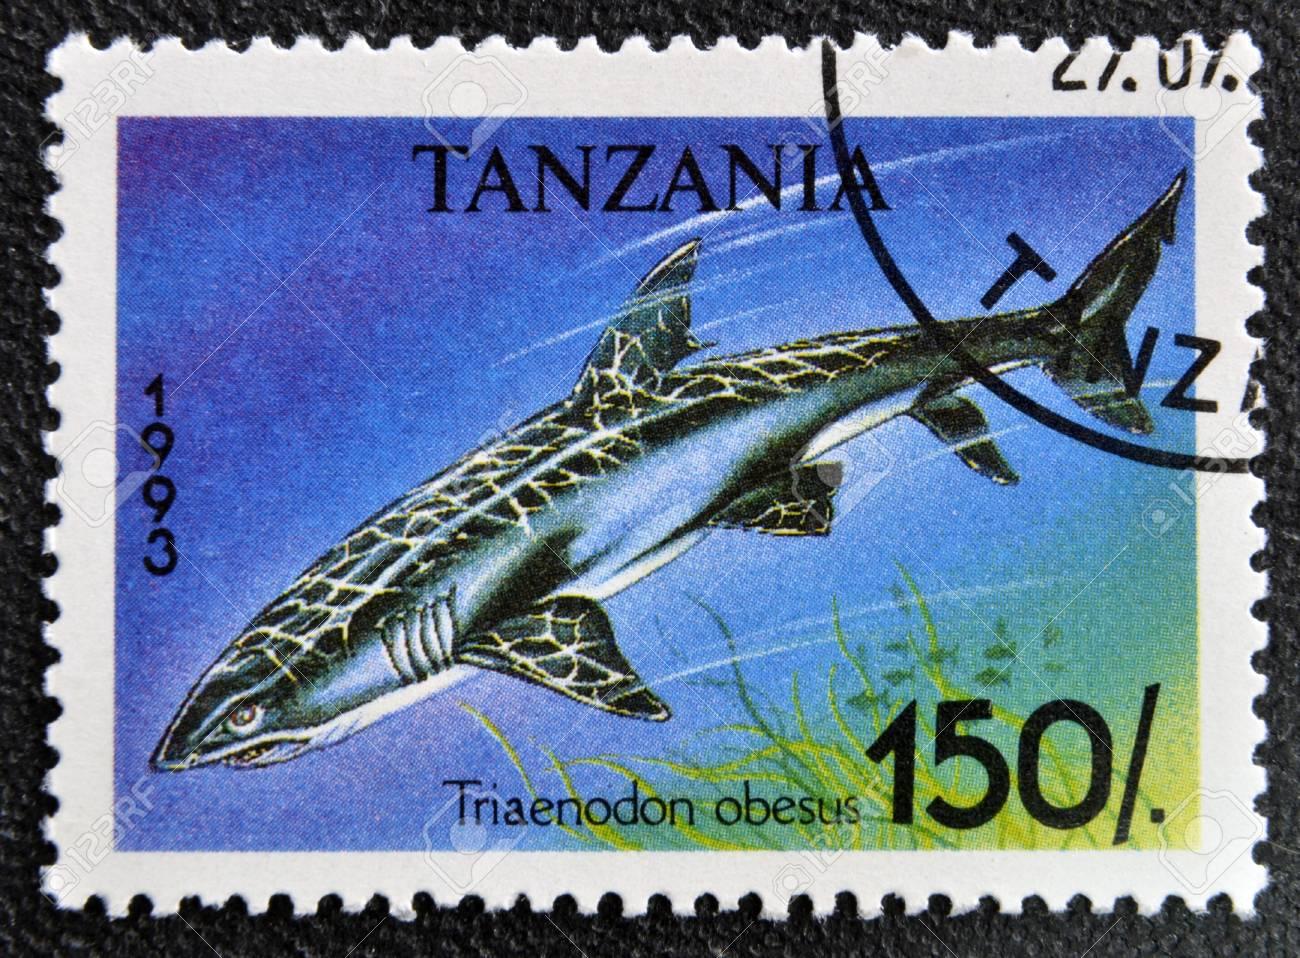 TANZANIA - CIRCA 1993: A stamp printed in Tanzania shows Whitetip reef shark, Triaenodon obesus, circa 1993 Stock Photo - 16959495